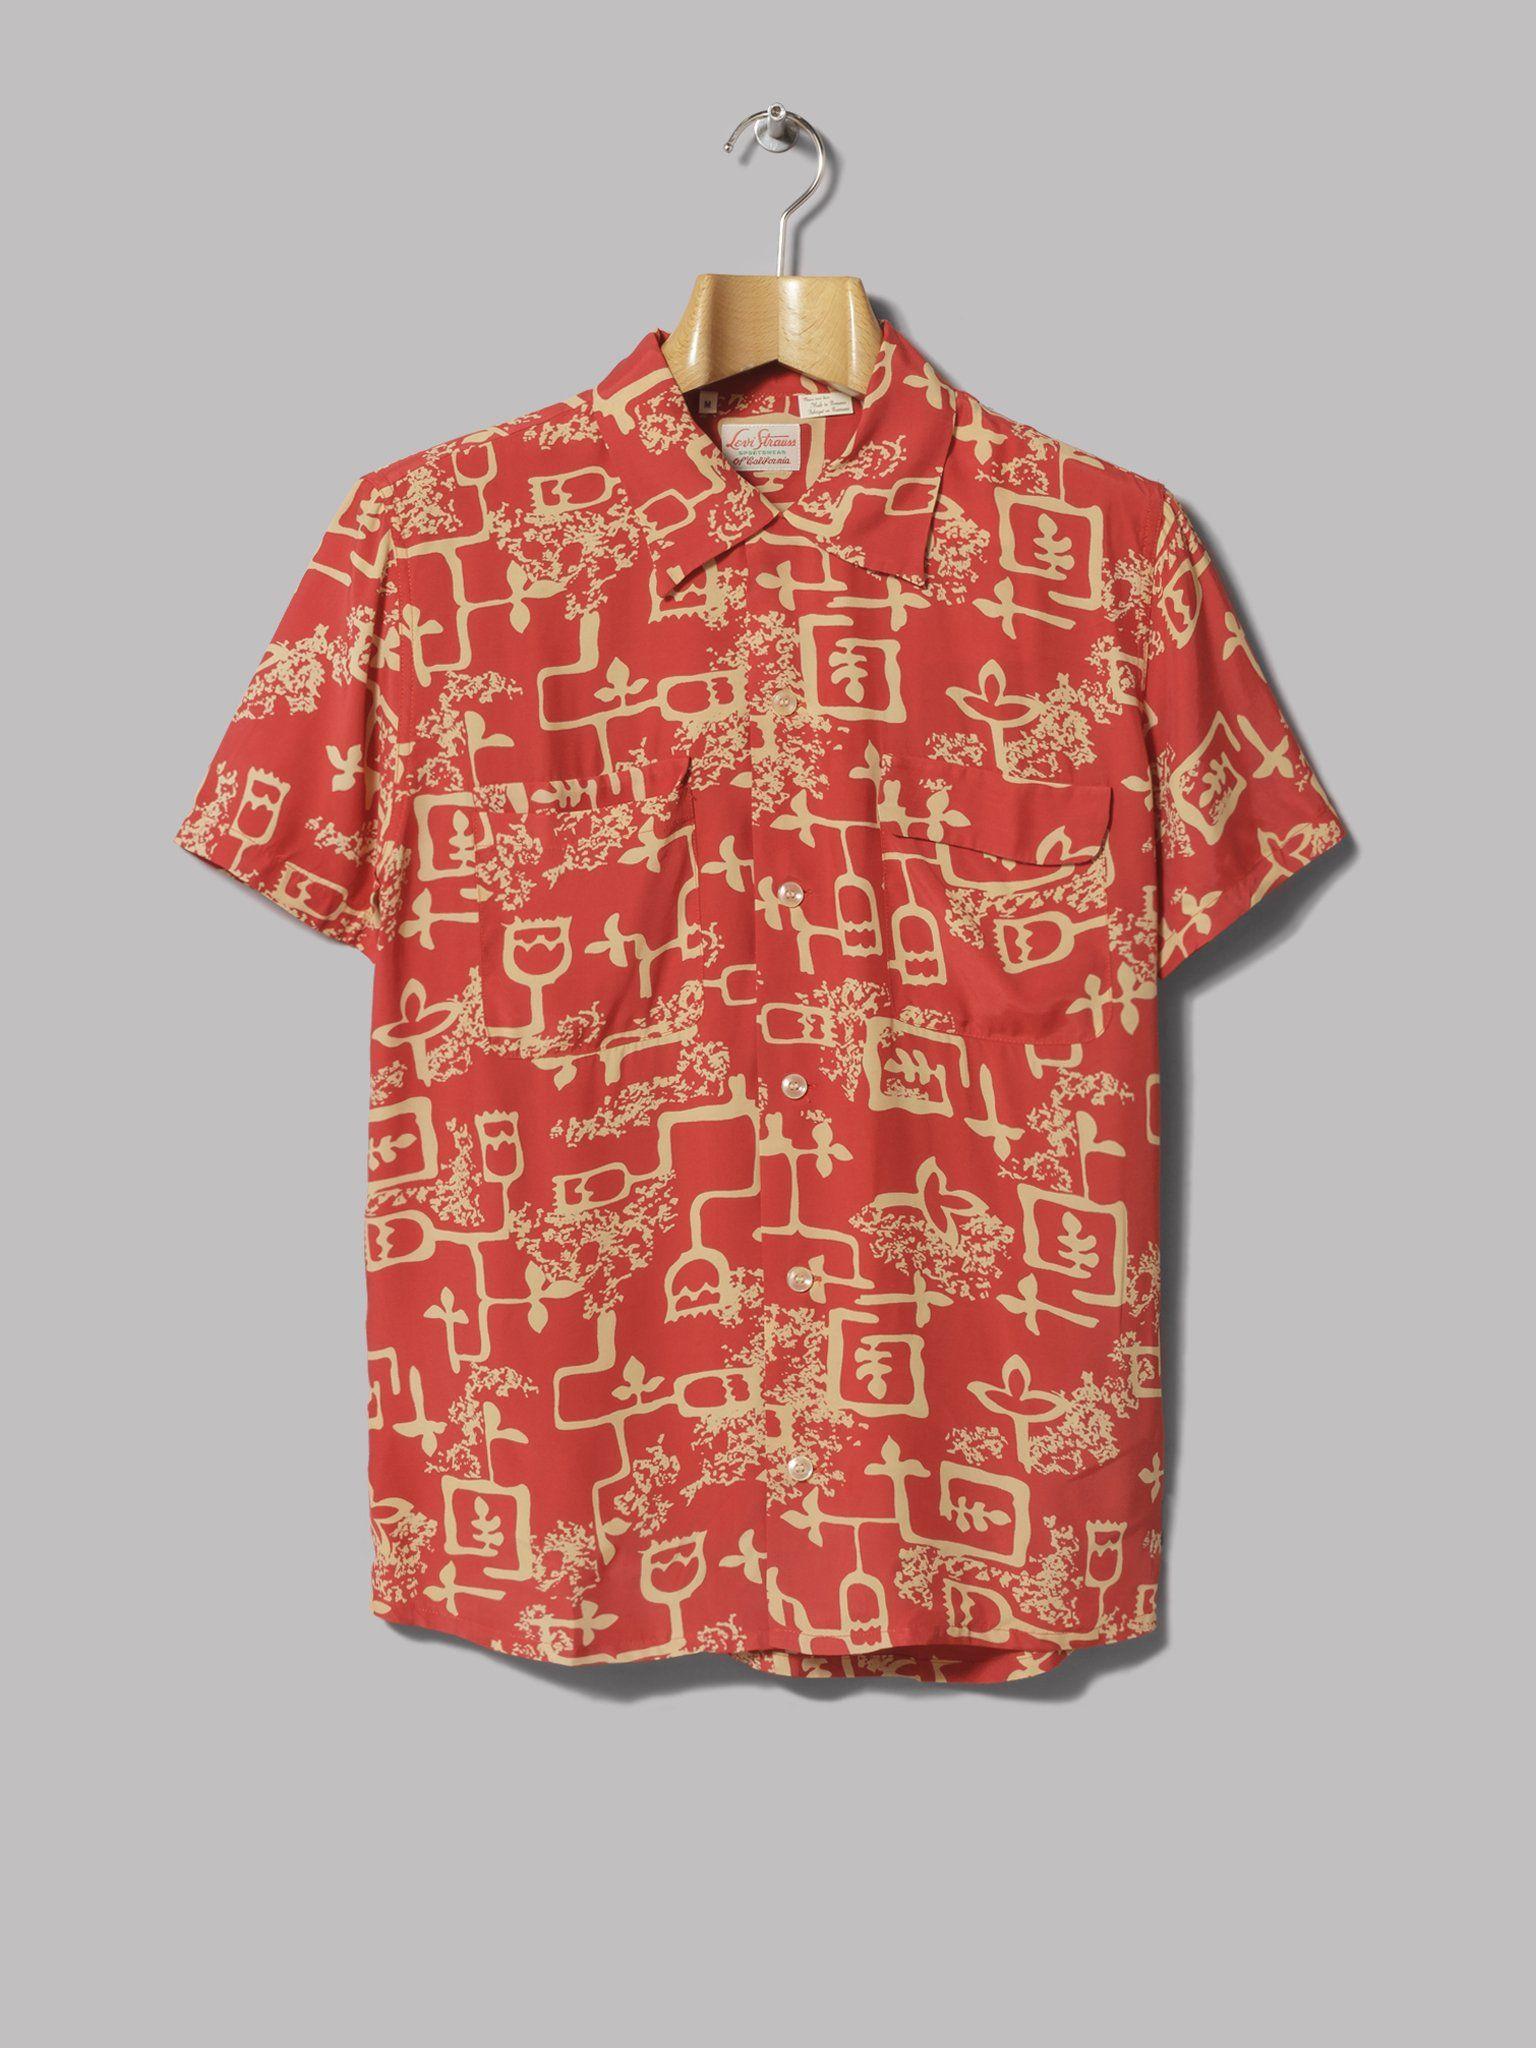 269eafcc Levi's Vintage Clothing 1940s Hawaiian Shirt (Lark Baked Apple ...